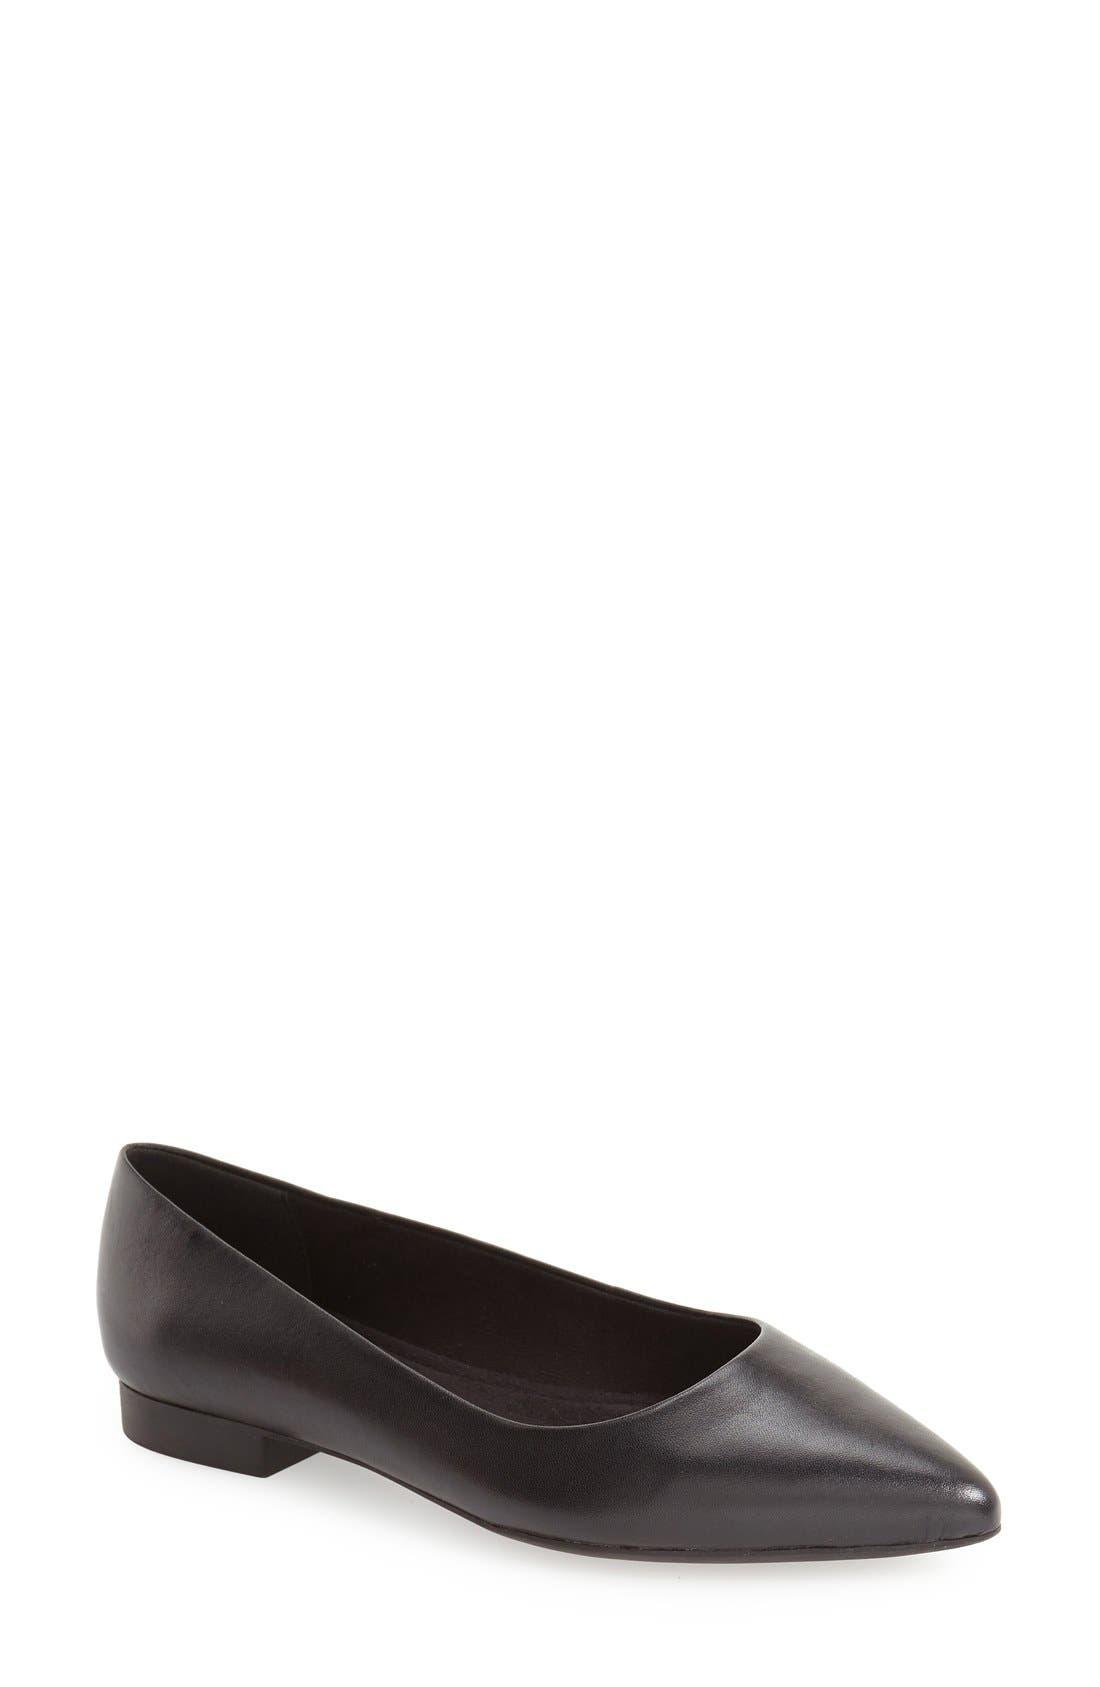 'Vivien' Pointy Toe Flat,                             Main thumbnail 1, color,                             Black Leather